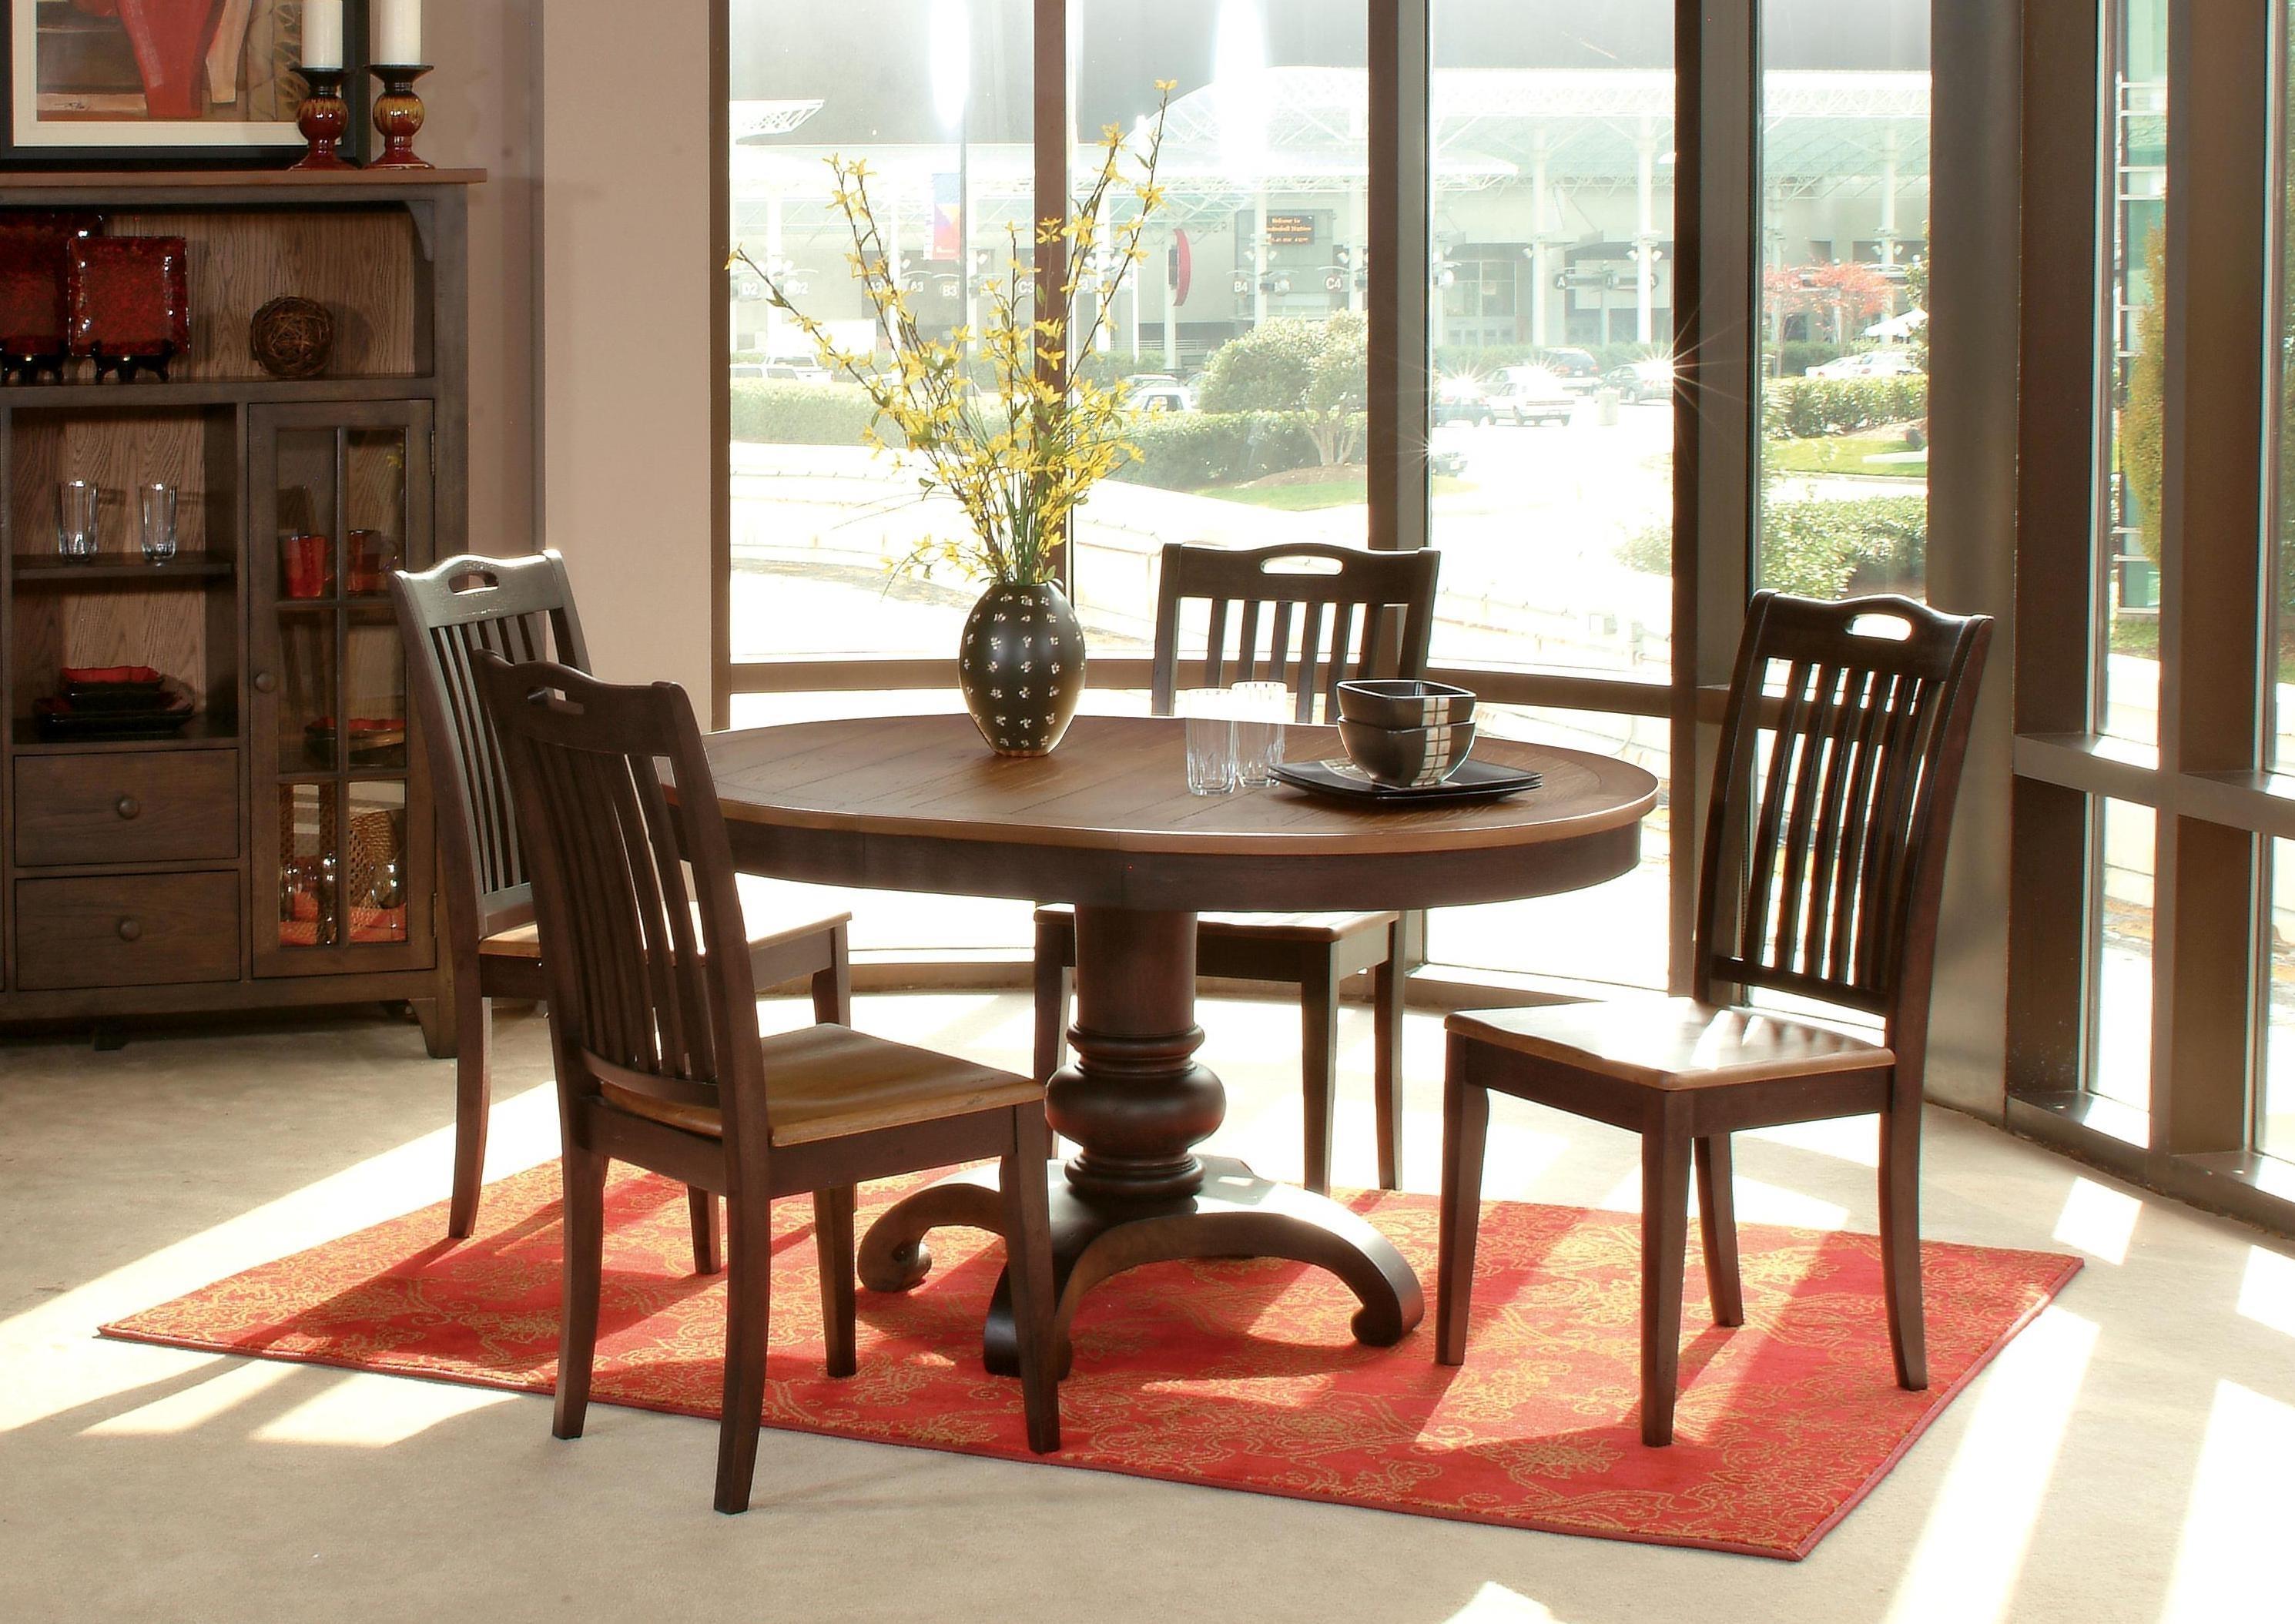 Beau Morris Home Furnishings GraftonGrafton 5 Piece Dining Set